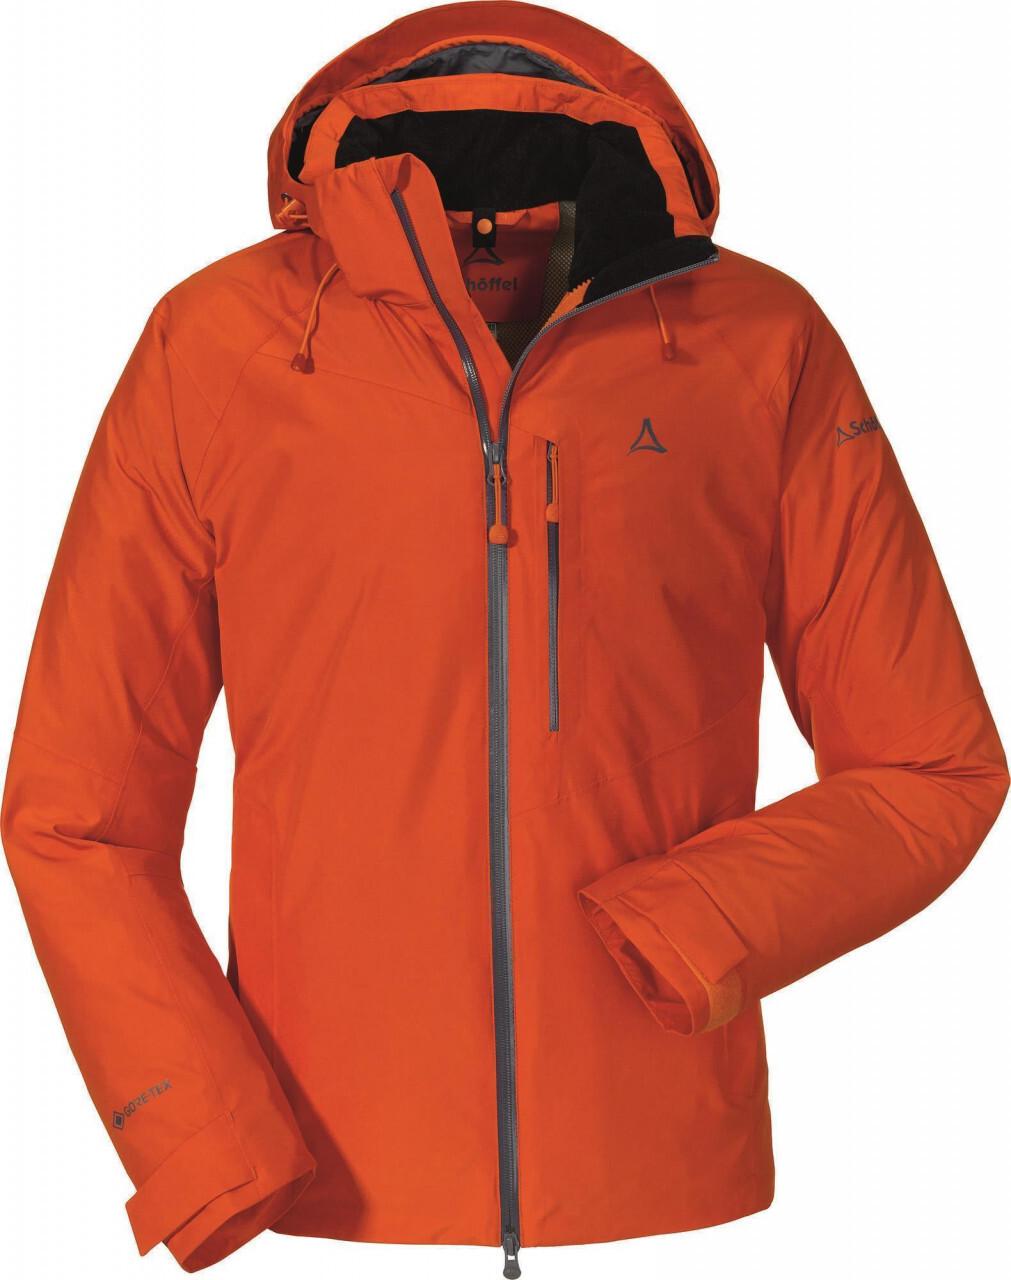 Schöffel Jacket Padova3 ab € 205,54 | Preisvergleich bei